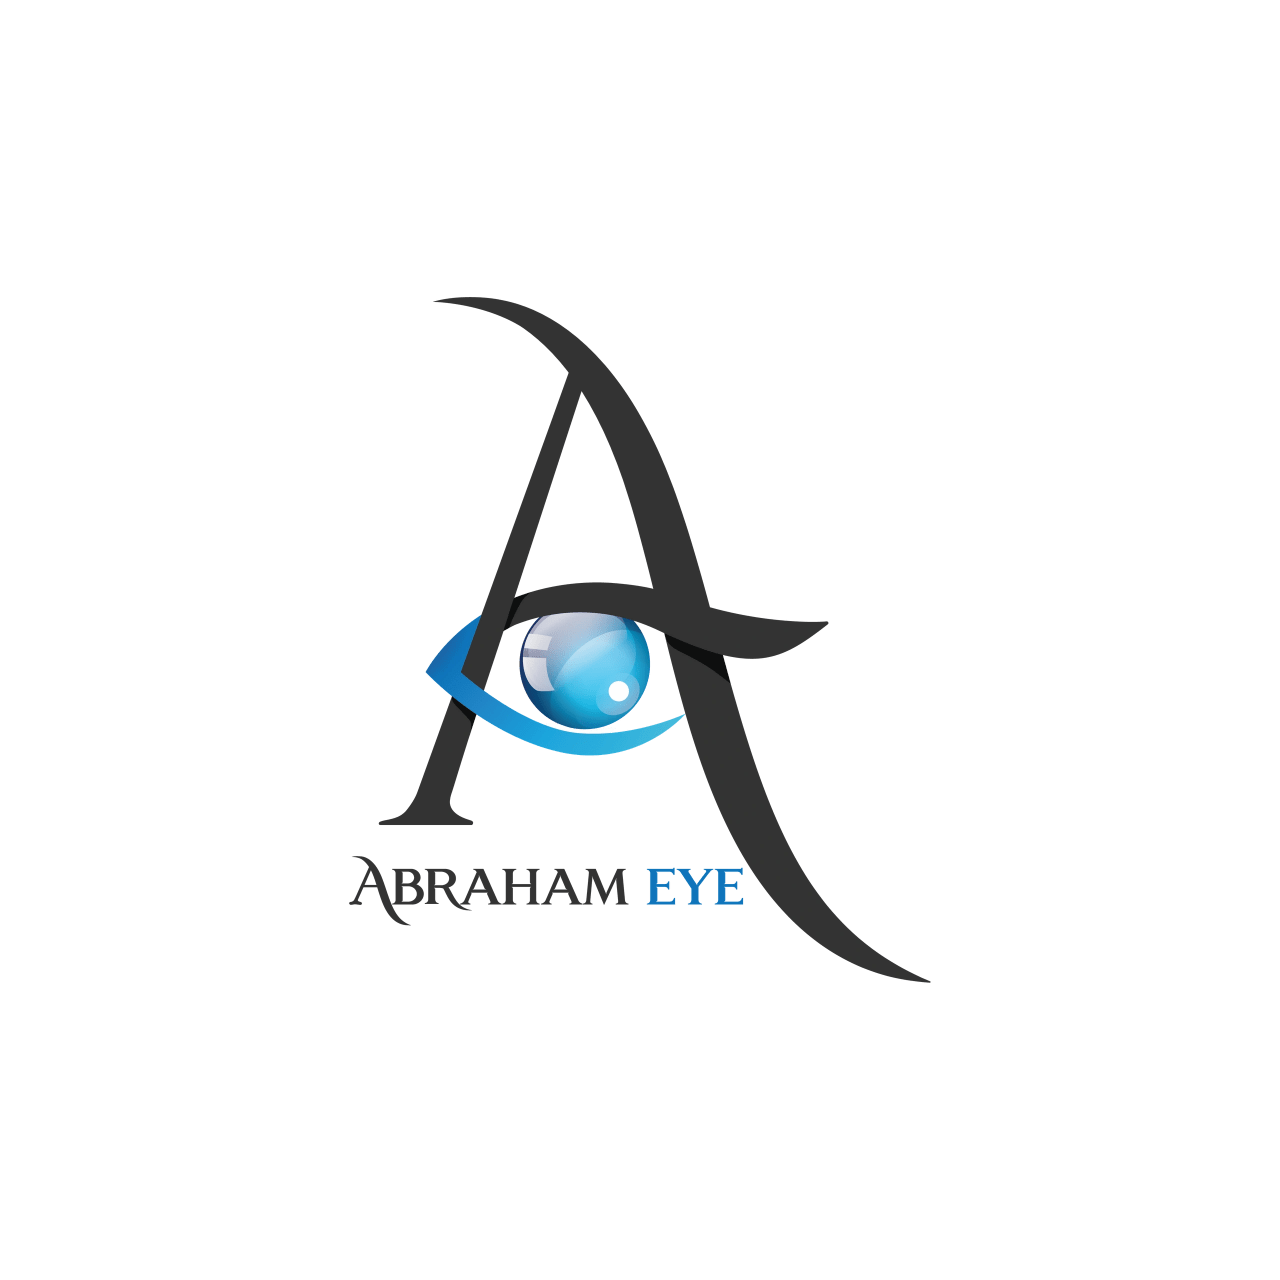 AbrahamEye